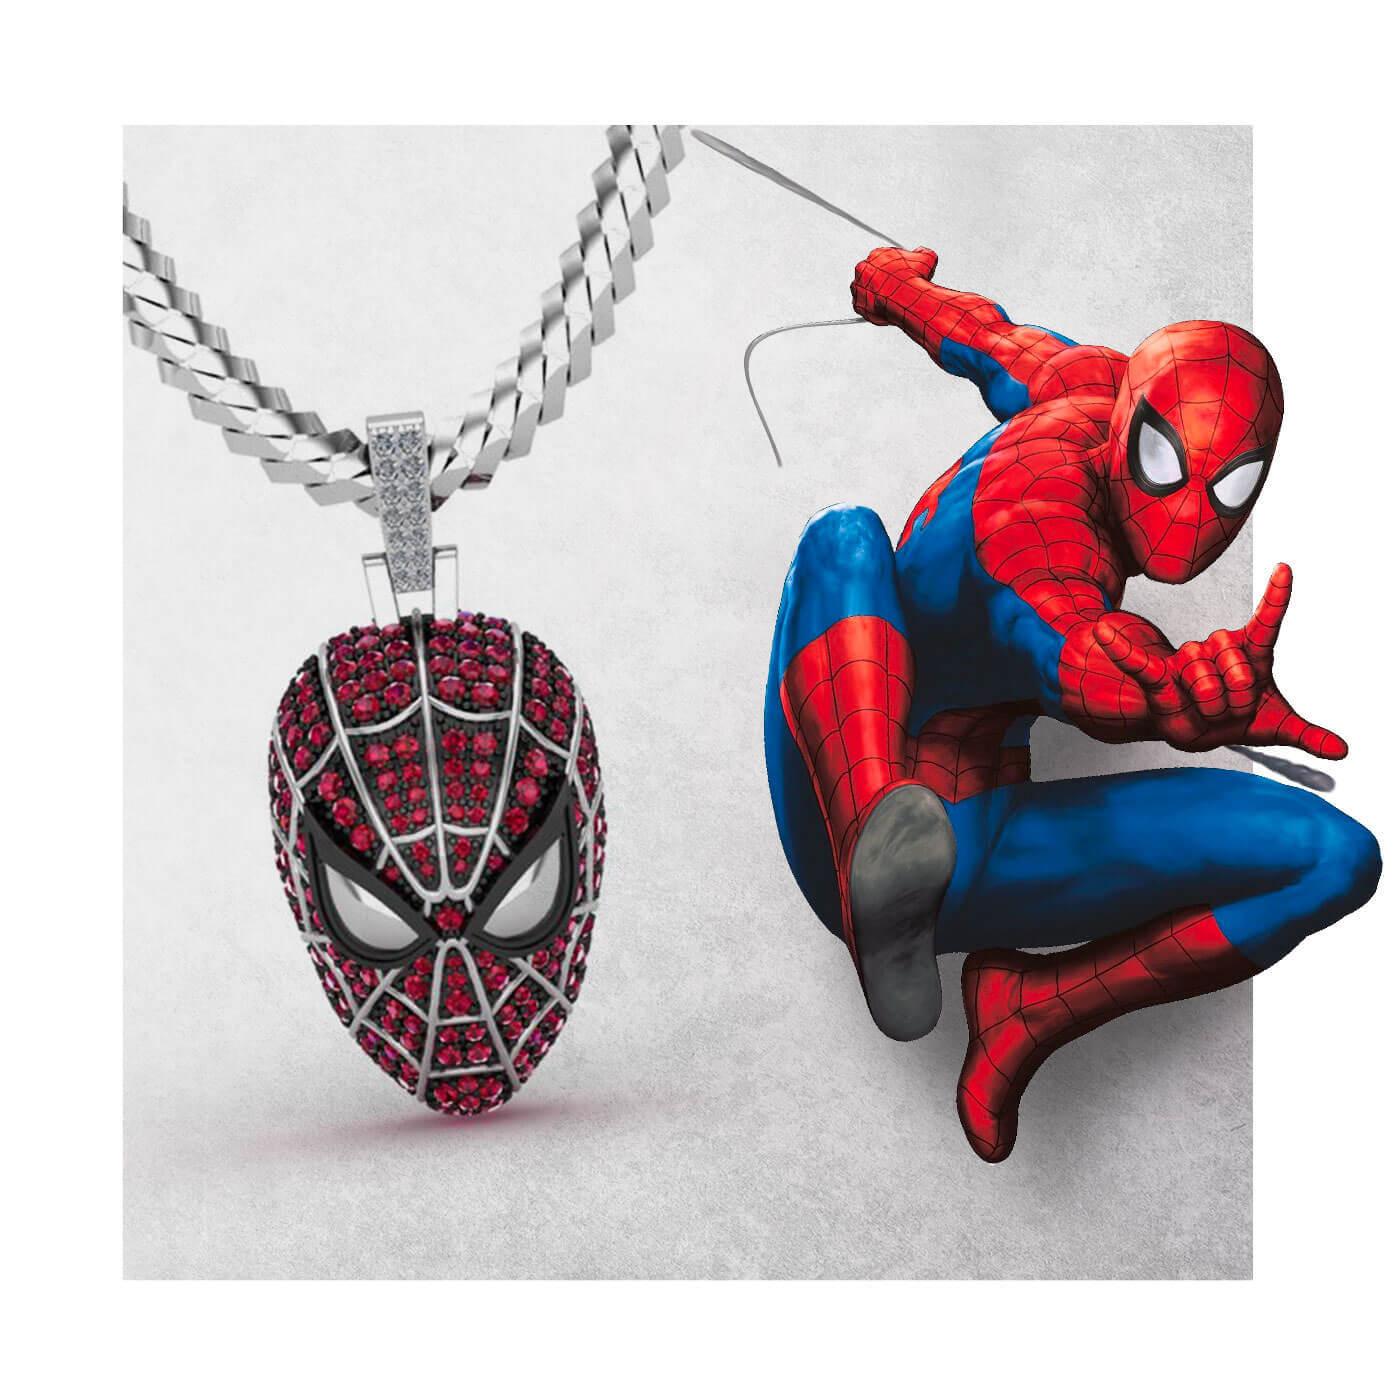 GLD x MARVEL Partner to Create Jewelry Based on Iconic Superheroes